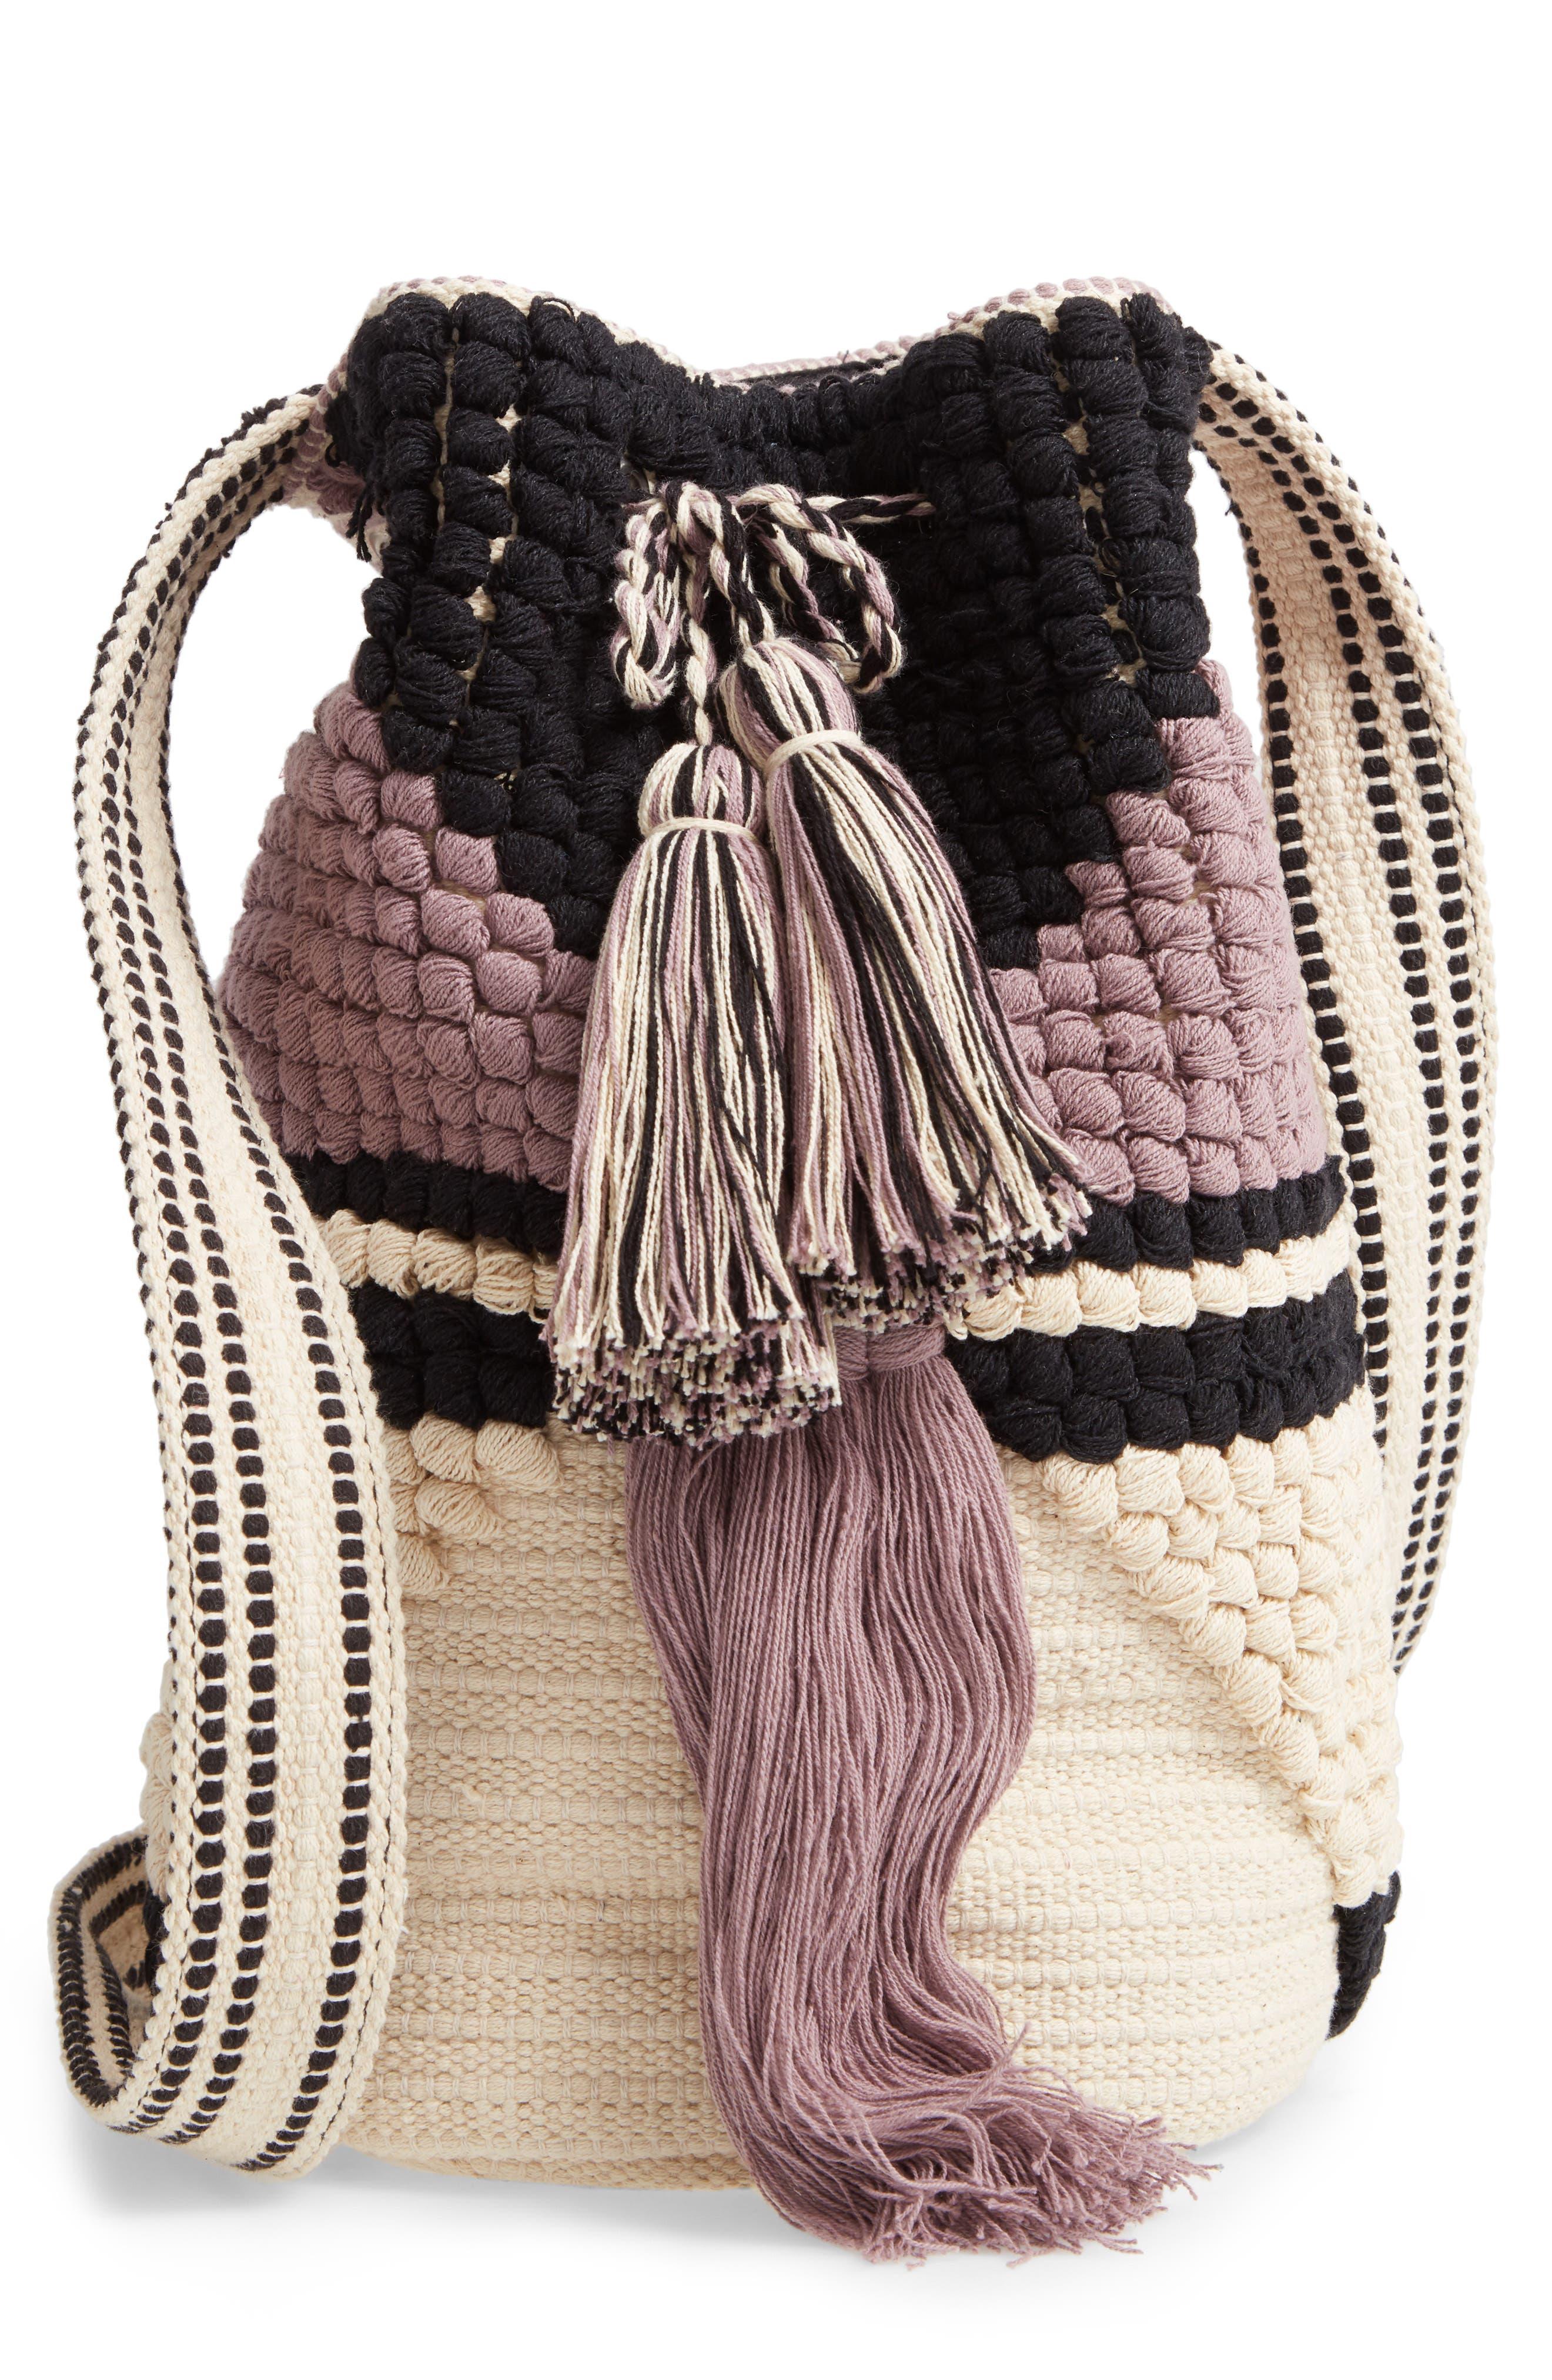 SOLE SOCIETY Halay Woven Bucket Bag, Main, color, 001